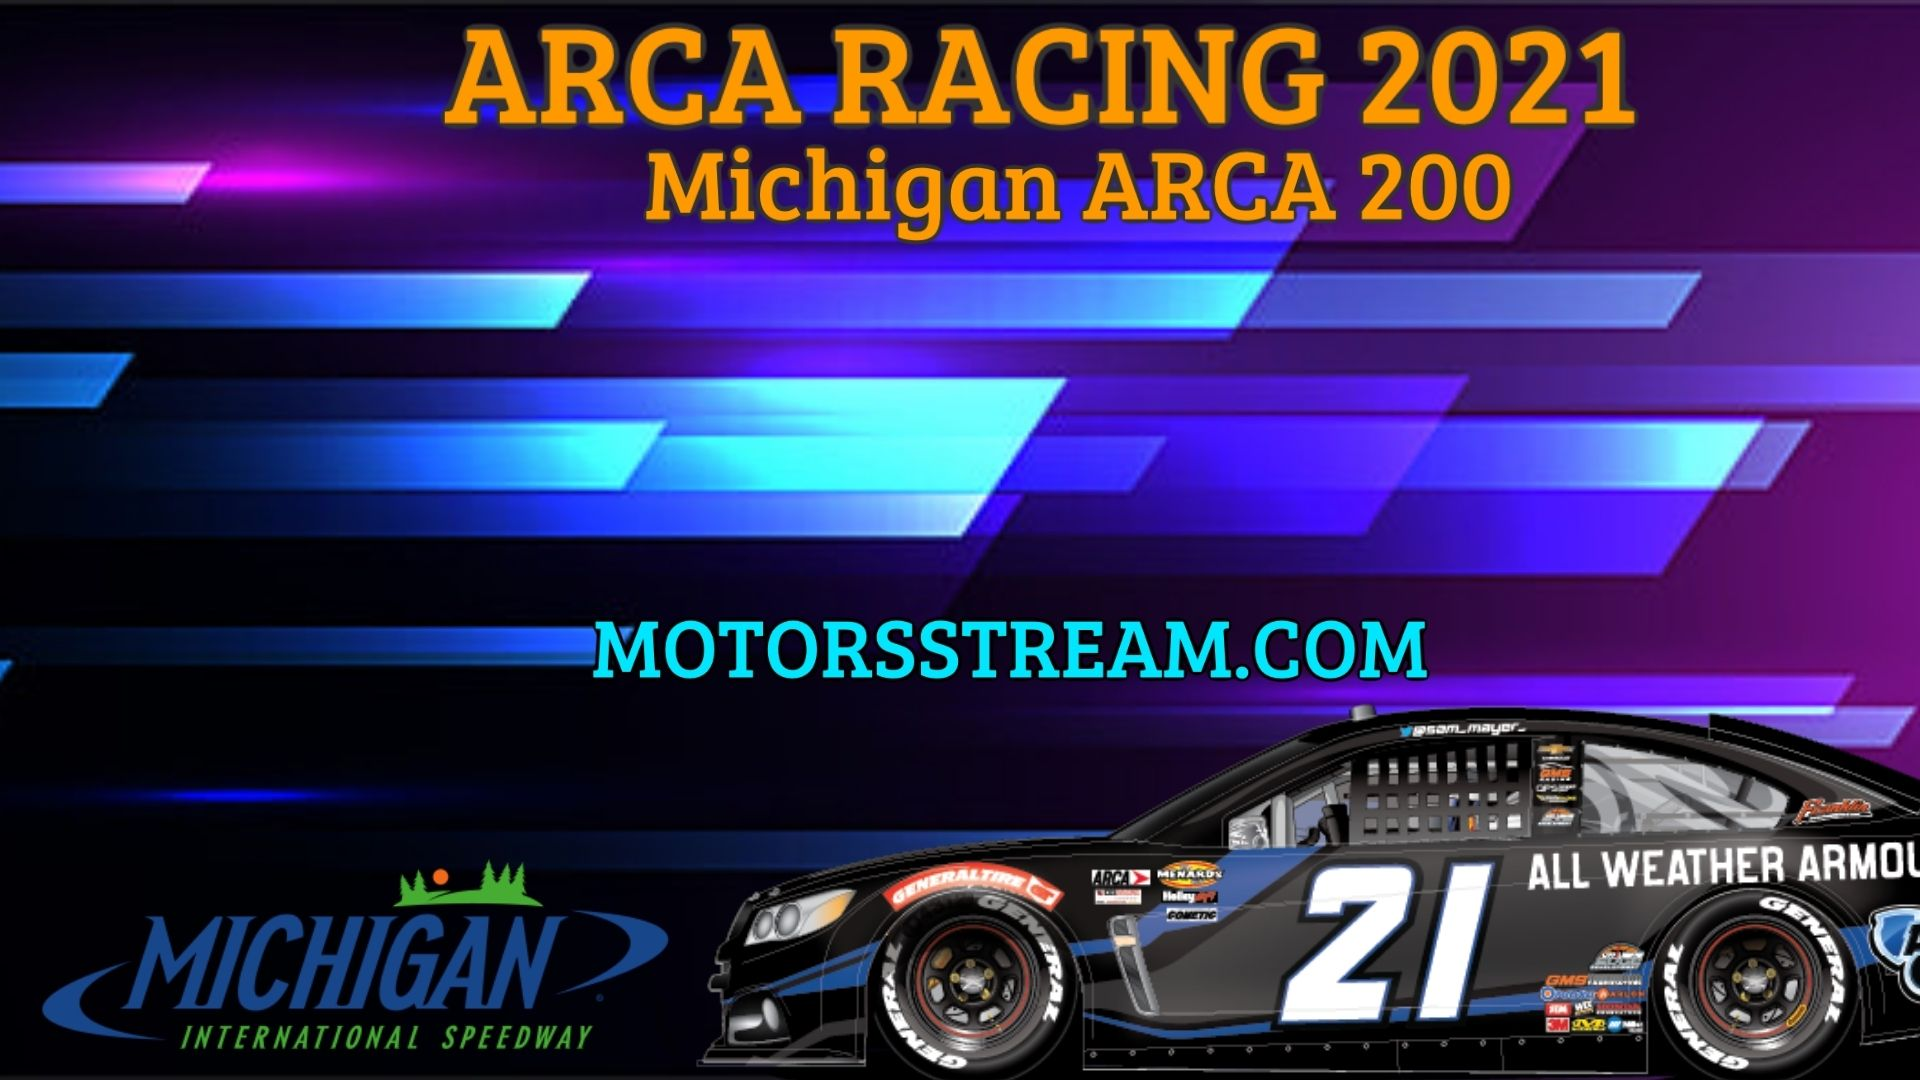 Michigan ARCA 200 Live Stream 2021 Arca Racing